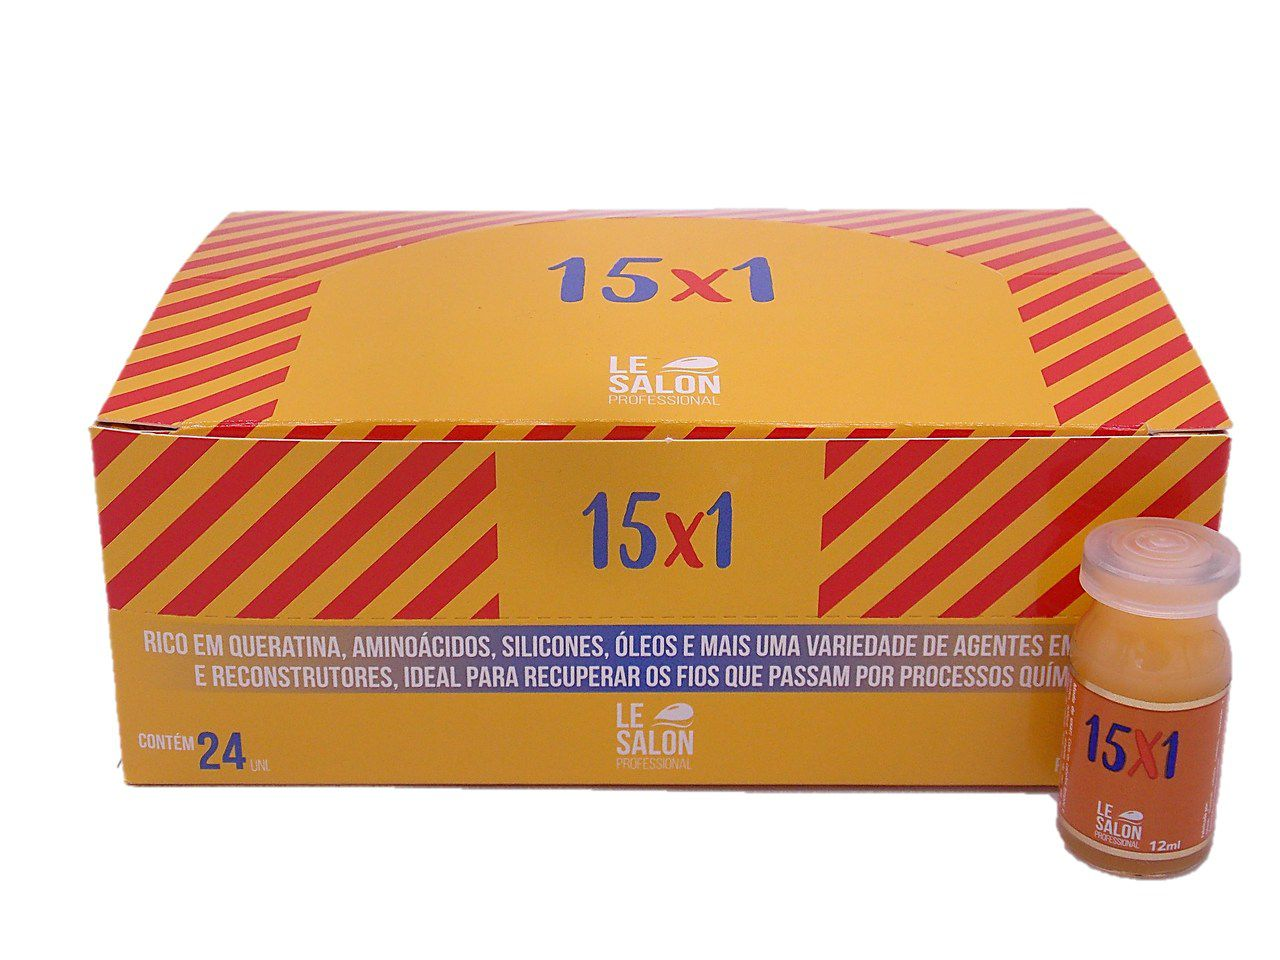 15x1 AMPOLA LE SALON - KIT C/ 24 UNIDADES